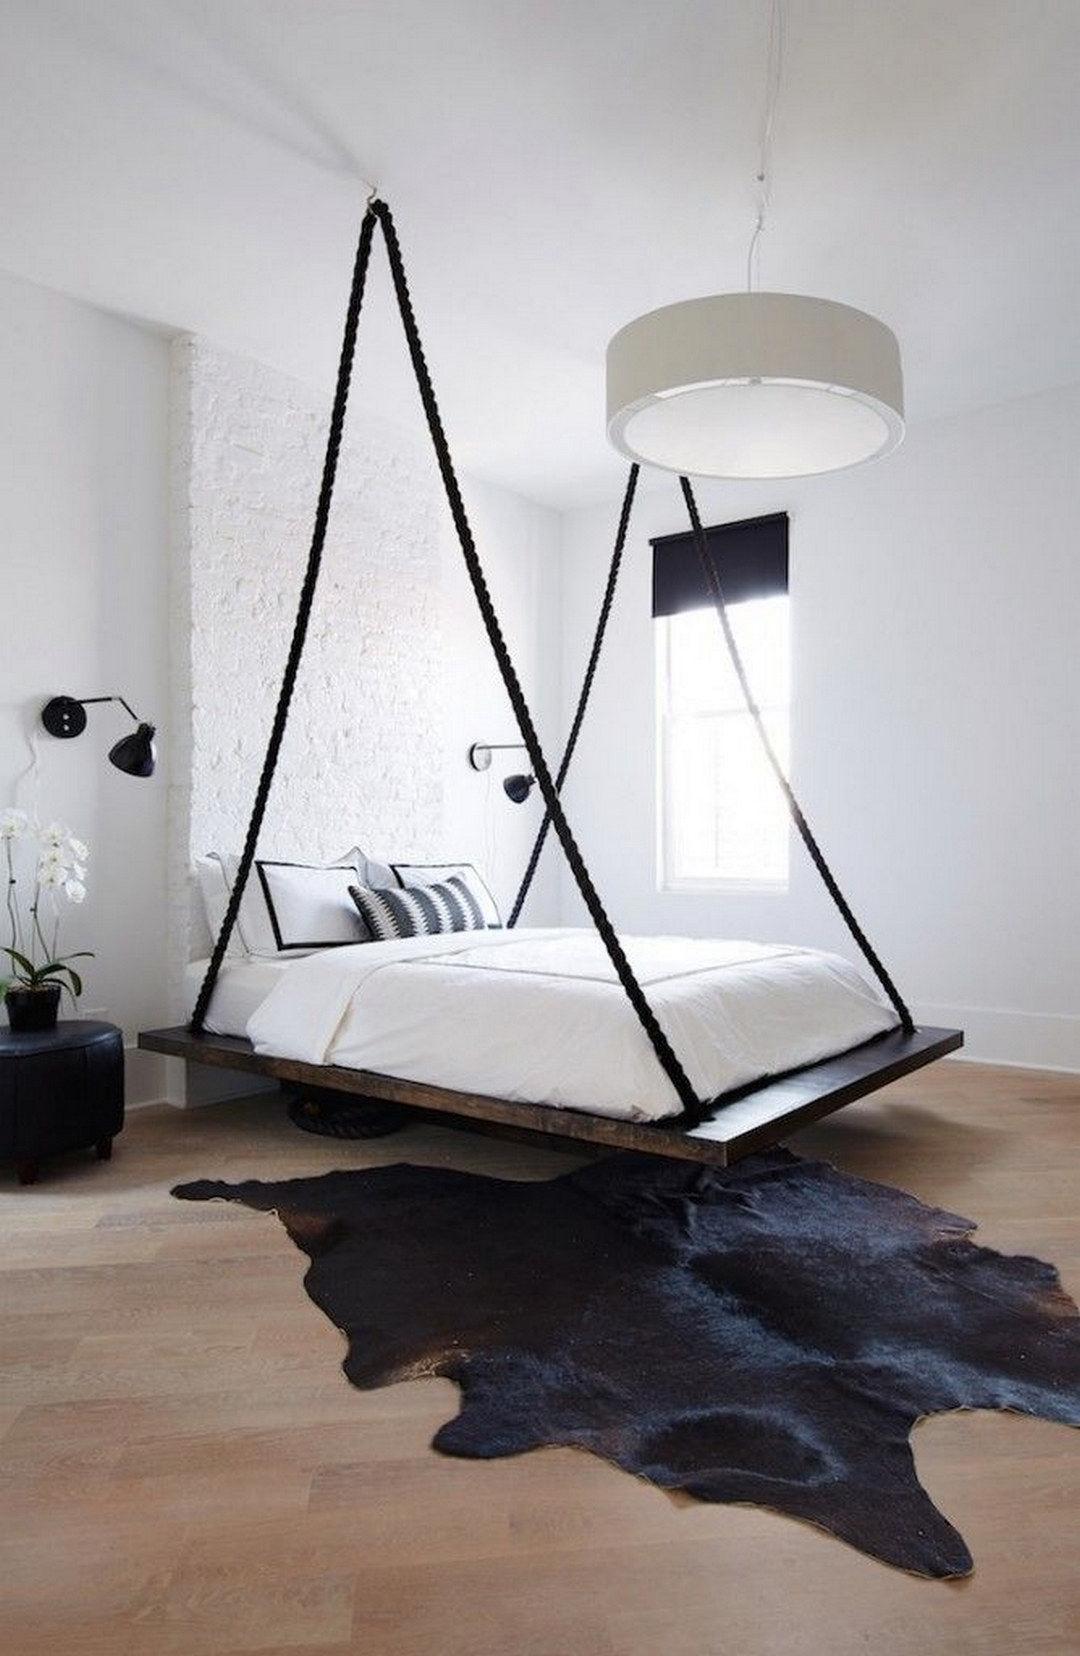 From Storage To Style 5 Reasons To Get A Platform Bed Minimalism Interior Minimal Interior Design Bed Design